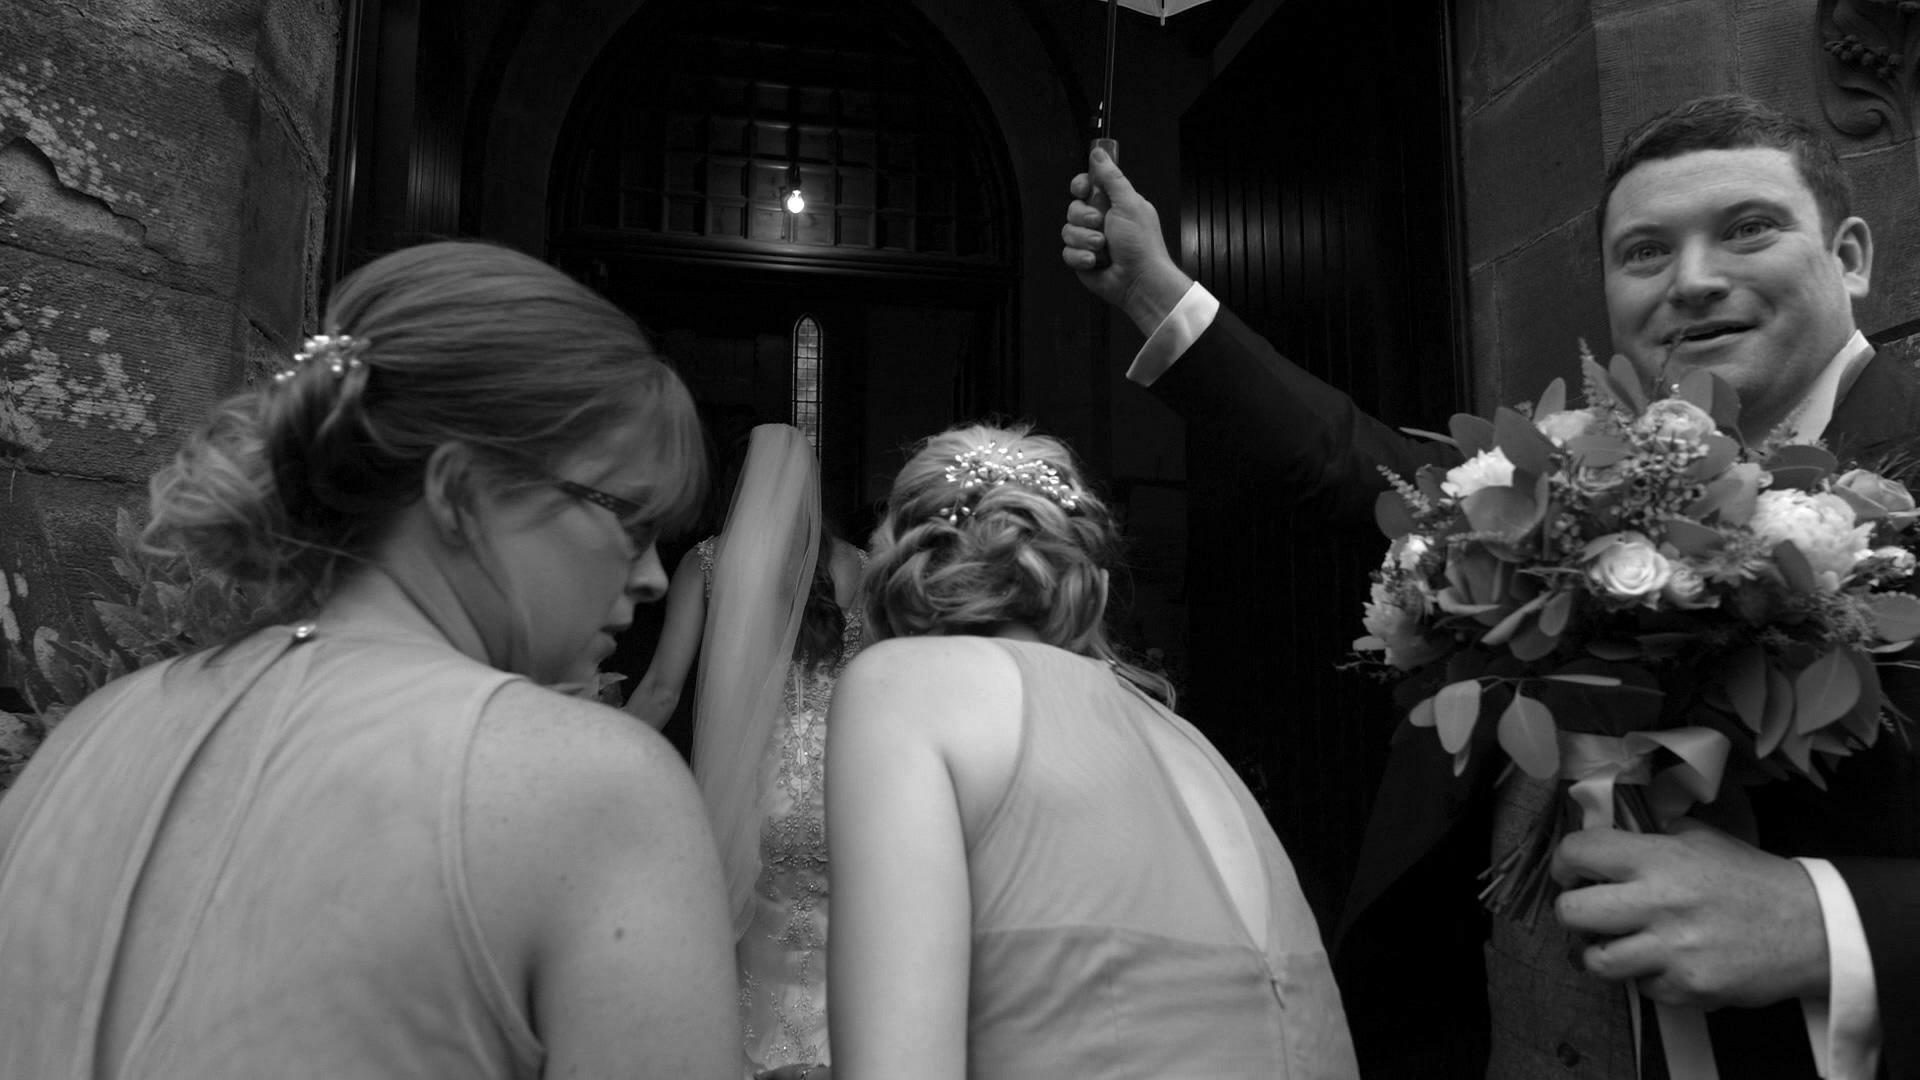 DRUMTOCHTY-SUMMER-WEDDING (09).jpg